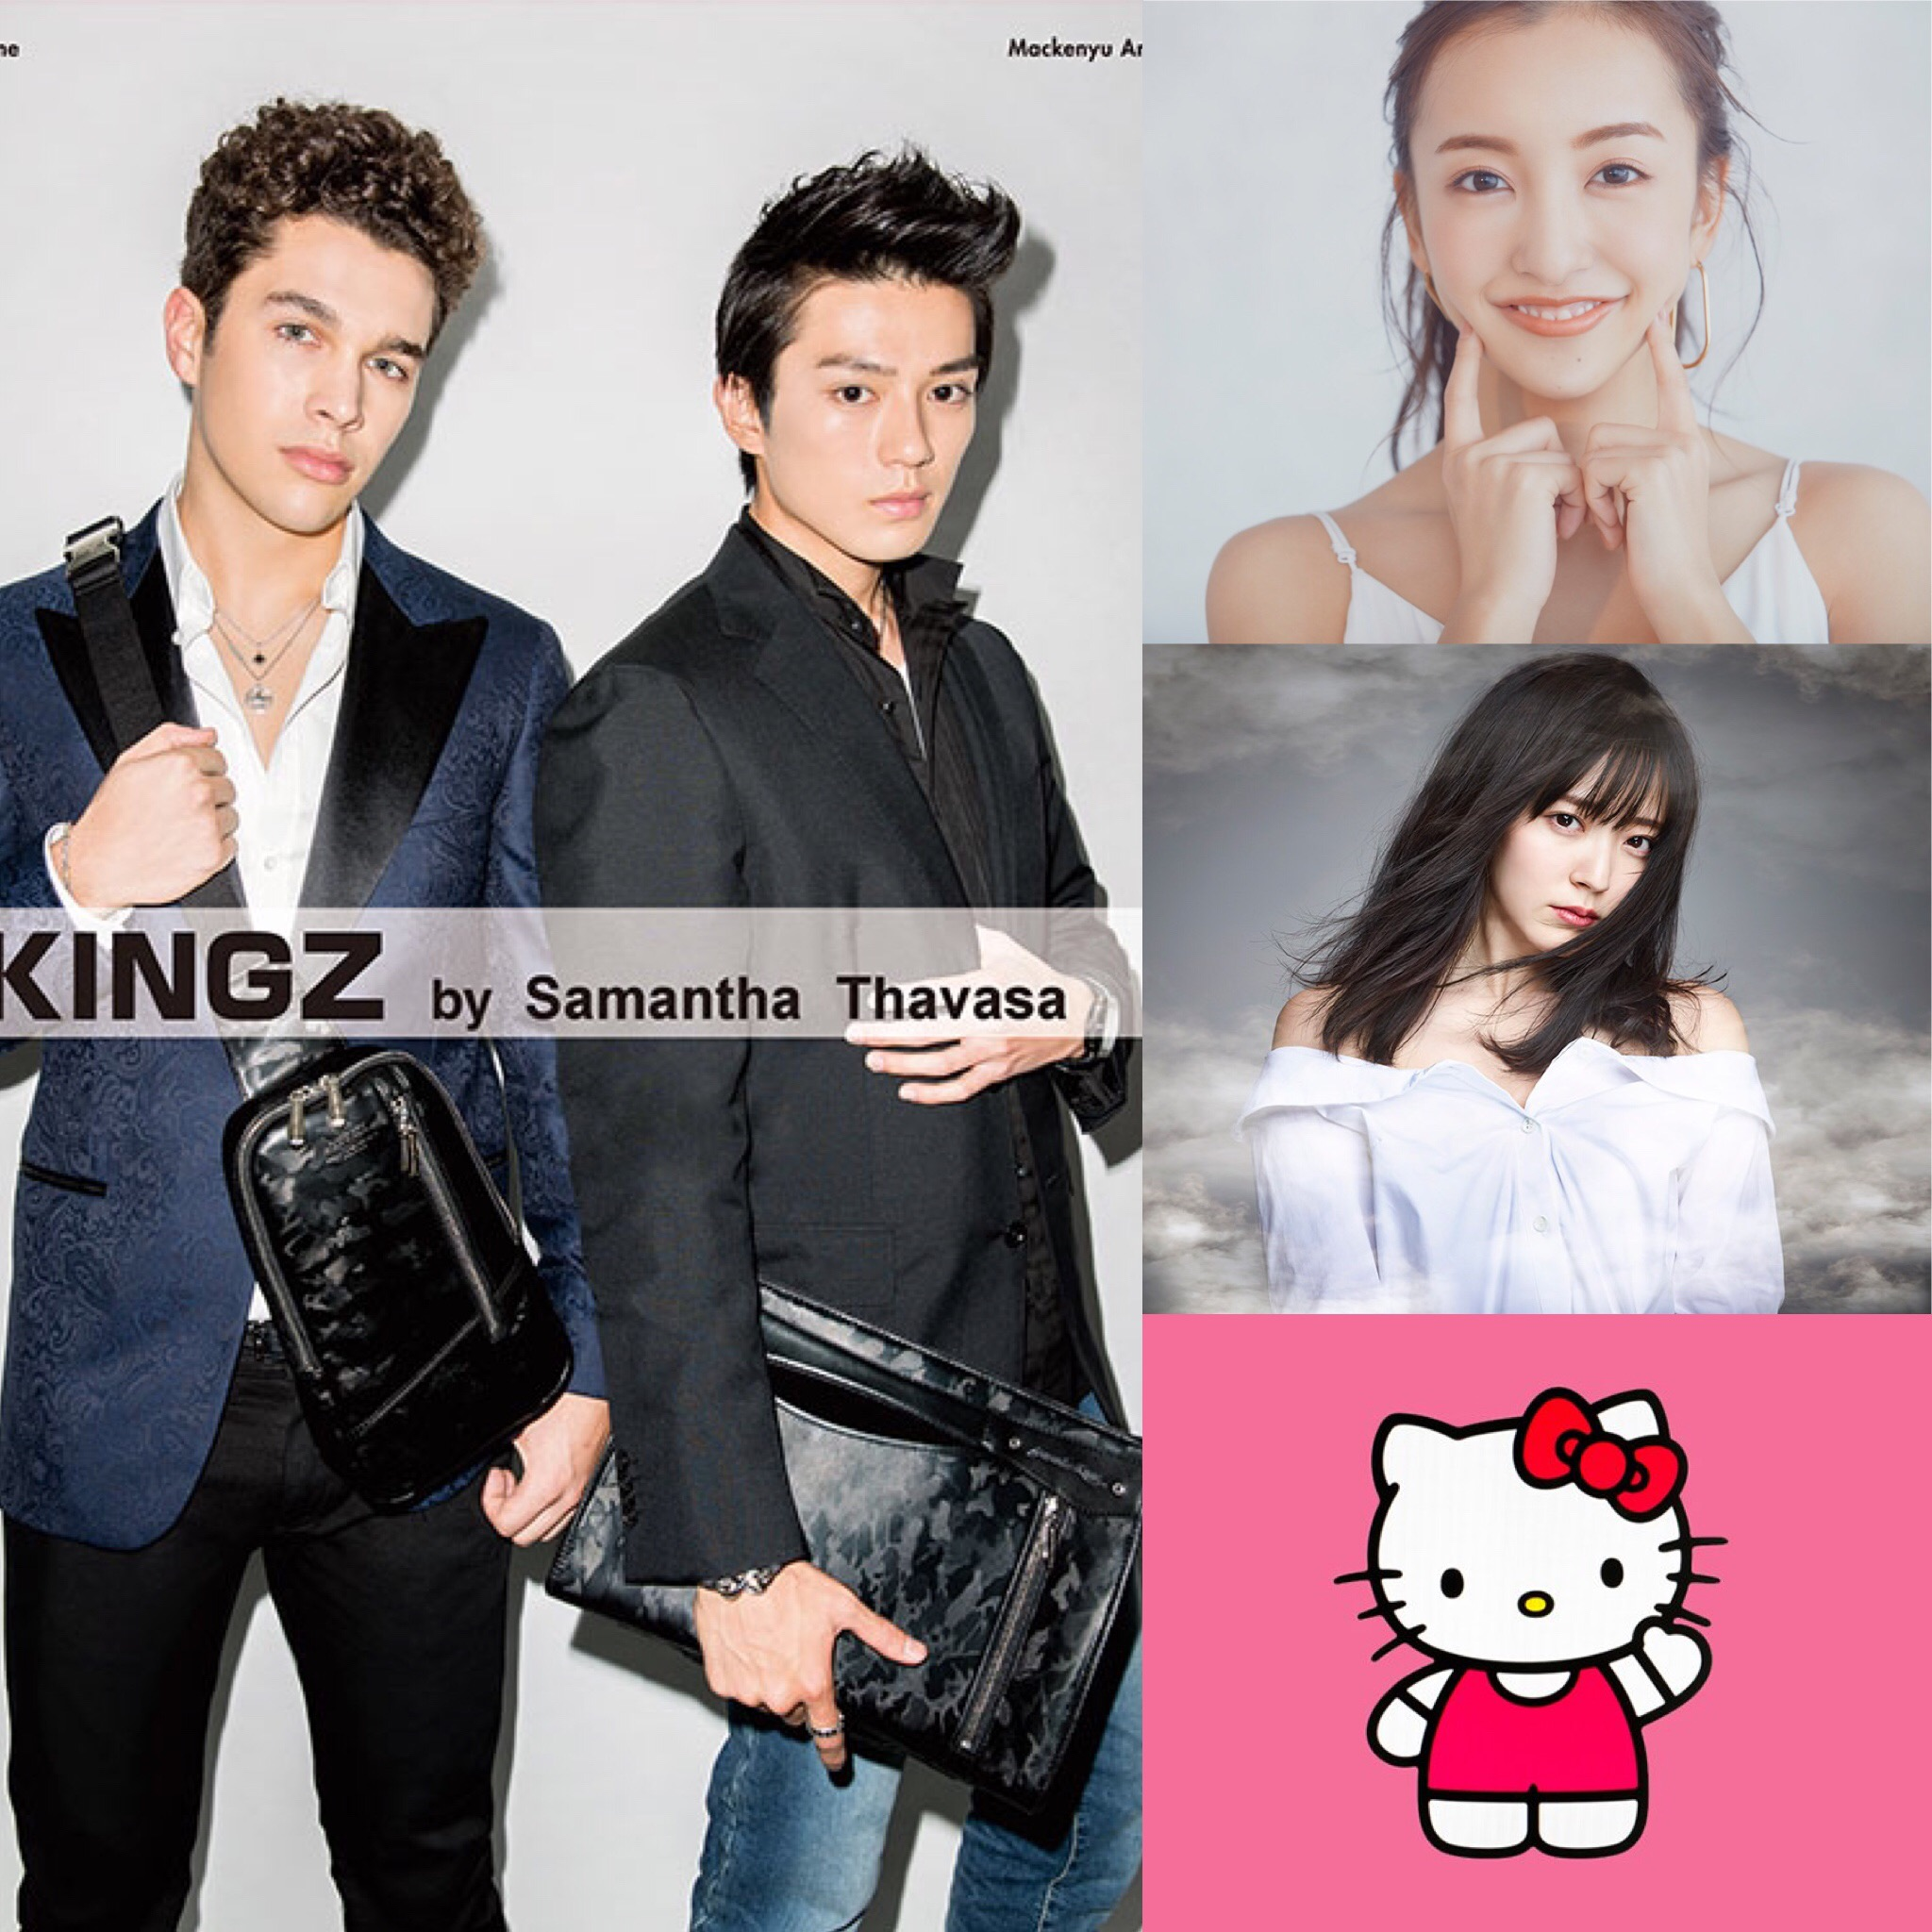 Mackenyu, Tomomi Itano, Austin Mahone, Airi Suzuki, Hello Kitty, & more team up for Samantha Thavasa's 25th anniversary.